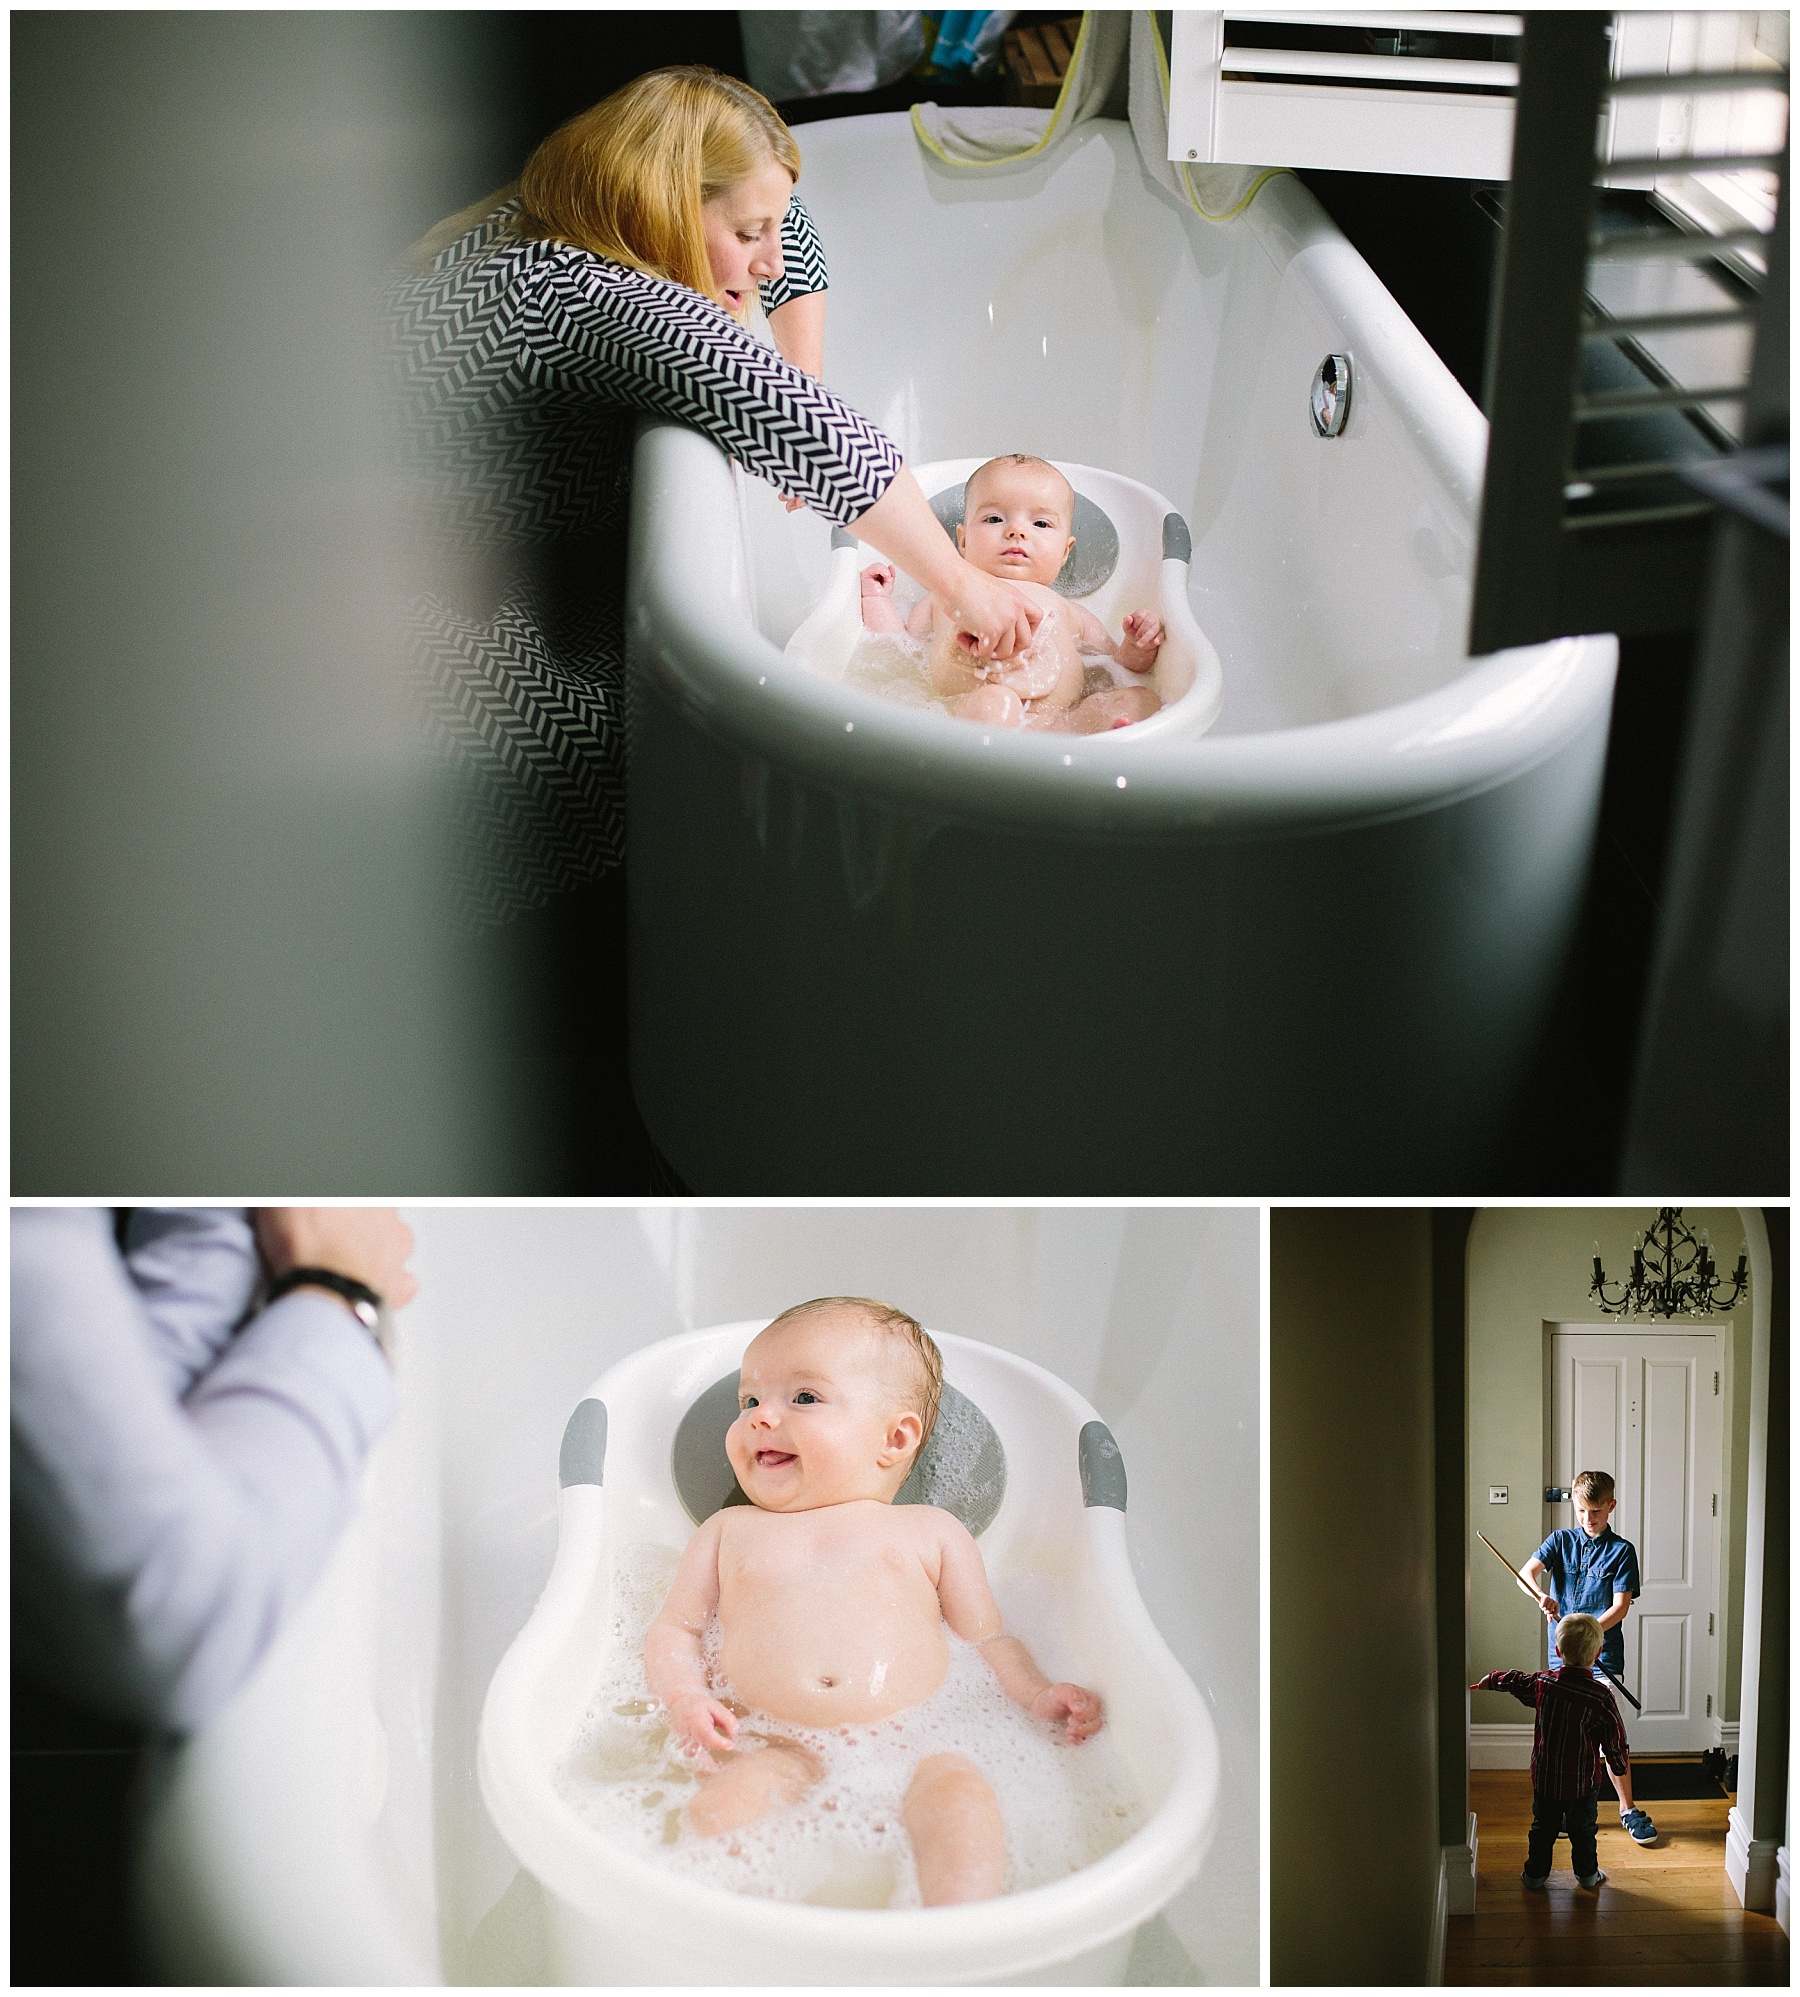 Lifestyle photographer Lancashire, Baby hotoraphy in bath